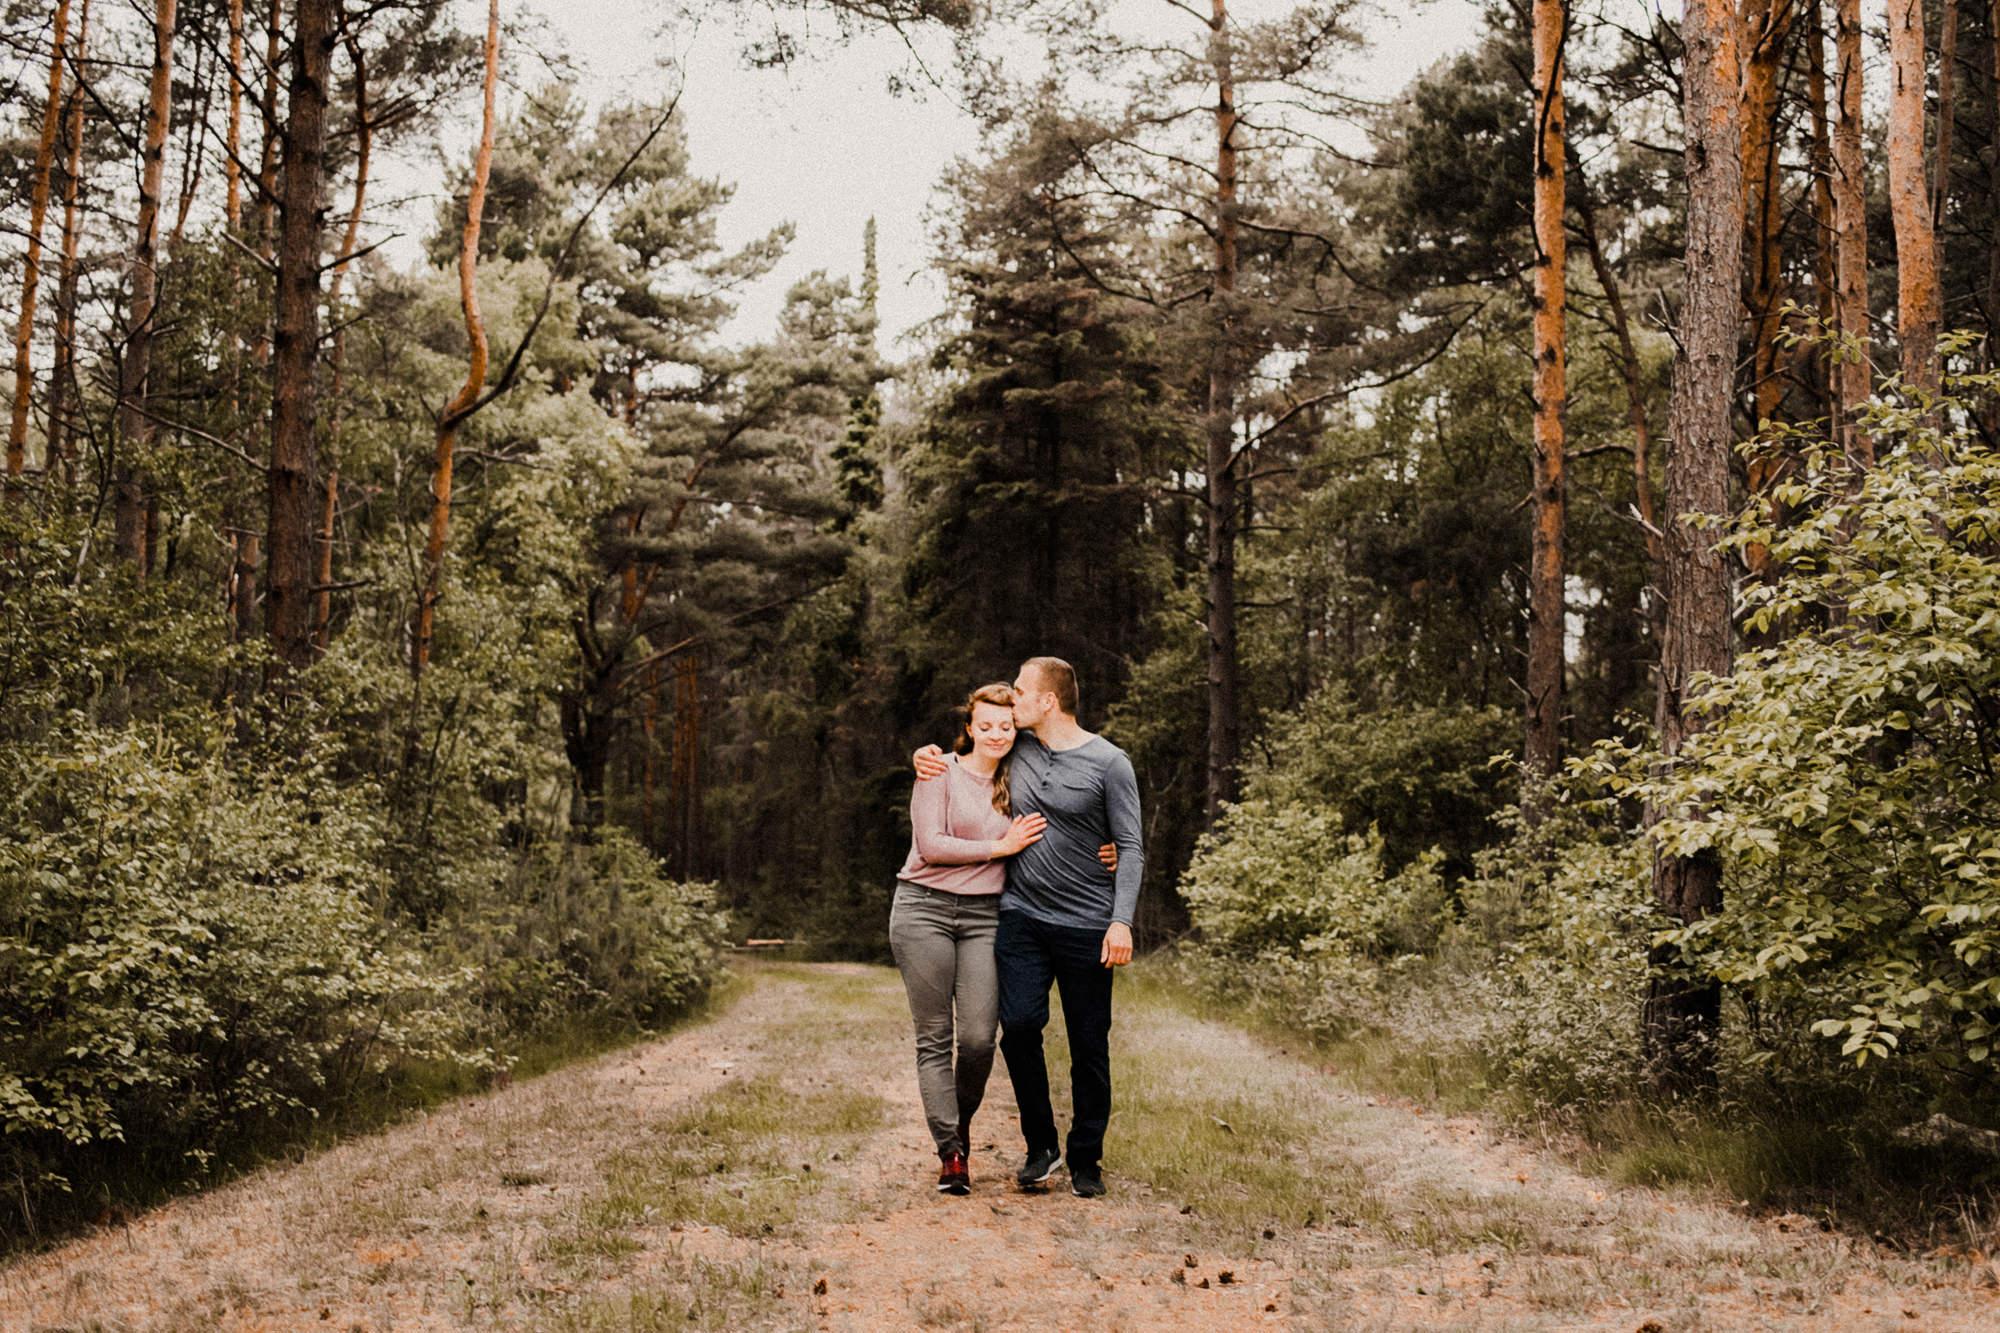 Pärchenfotografie - Darß - Zingst - Paarshooting - Wald - Dünen